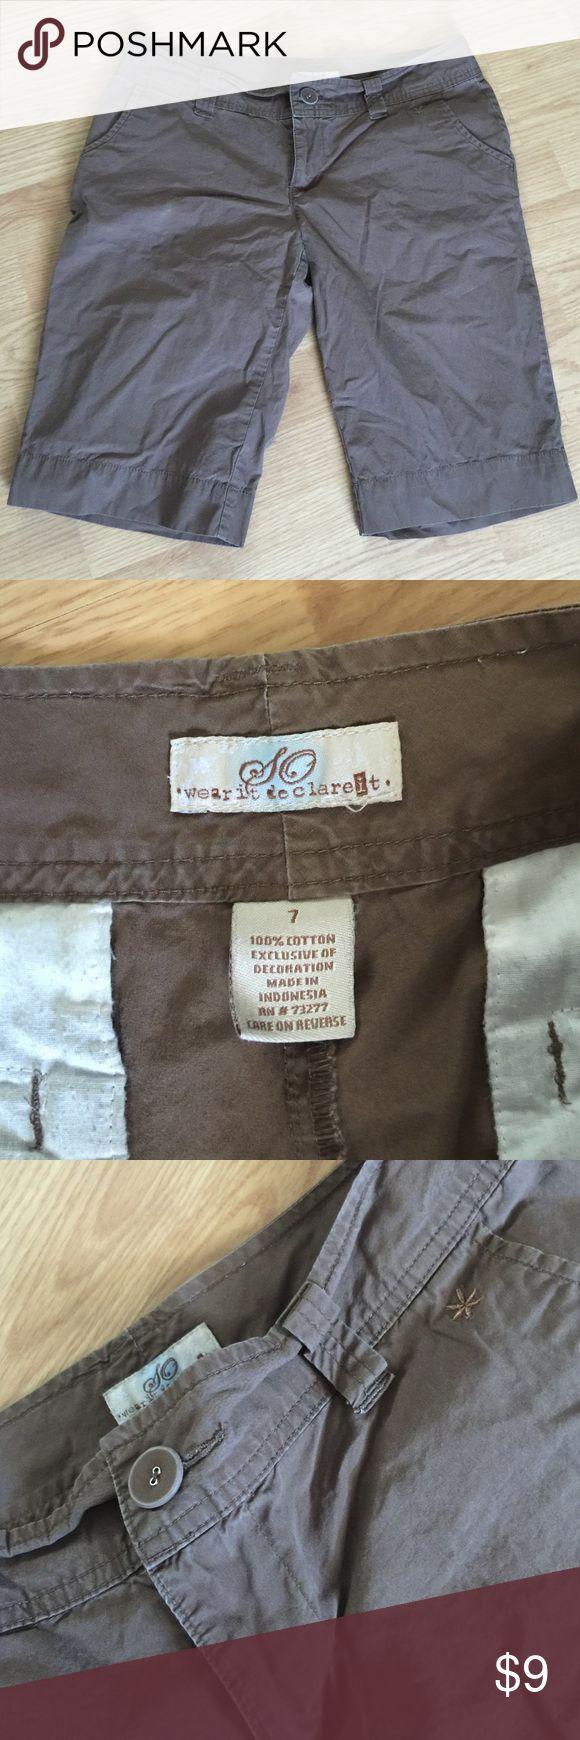 Women's brown shorts size 7 100% cotton Women's brown shorts size 7 100% cotton SO Shorts Cargos